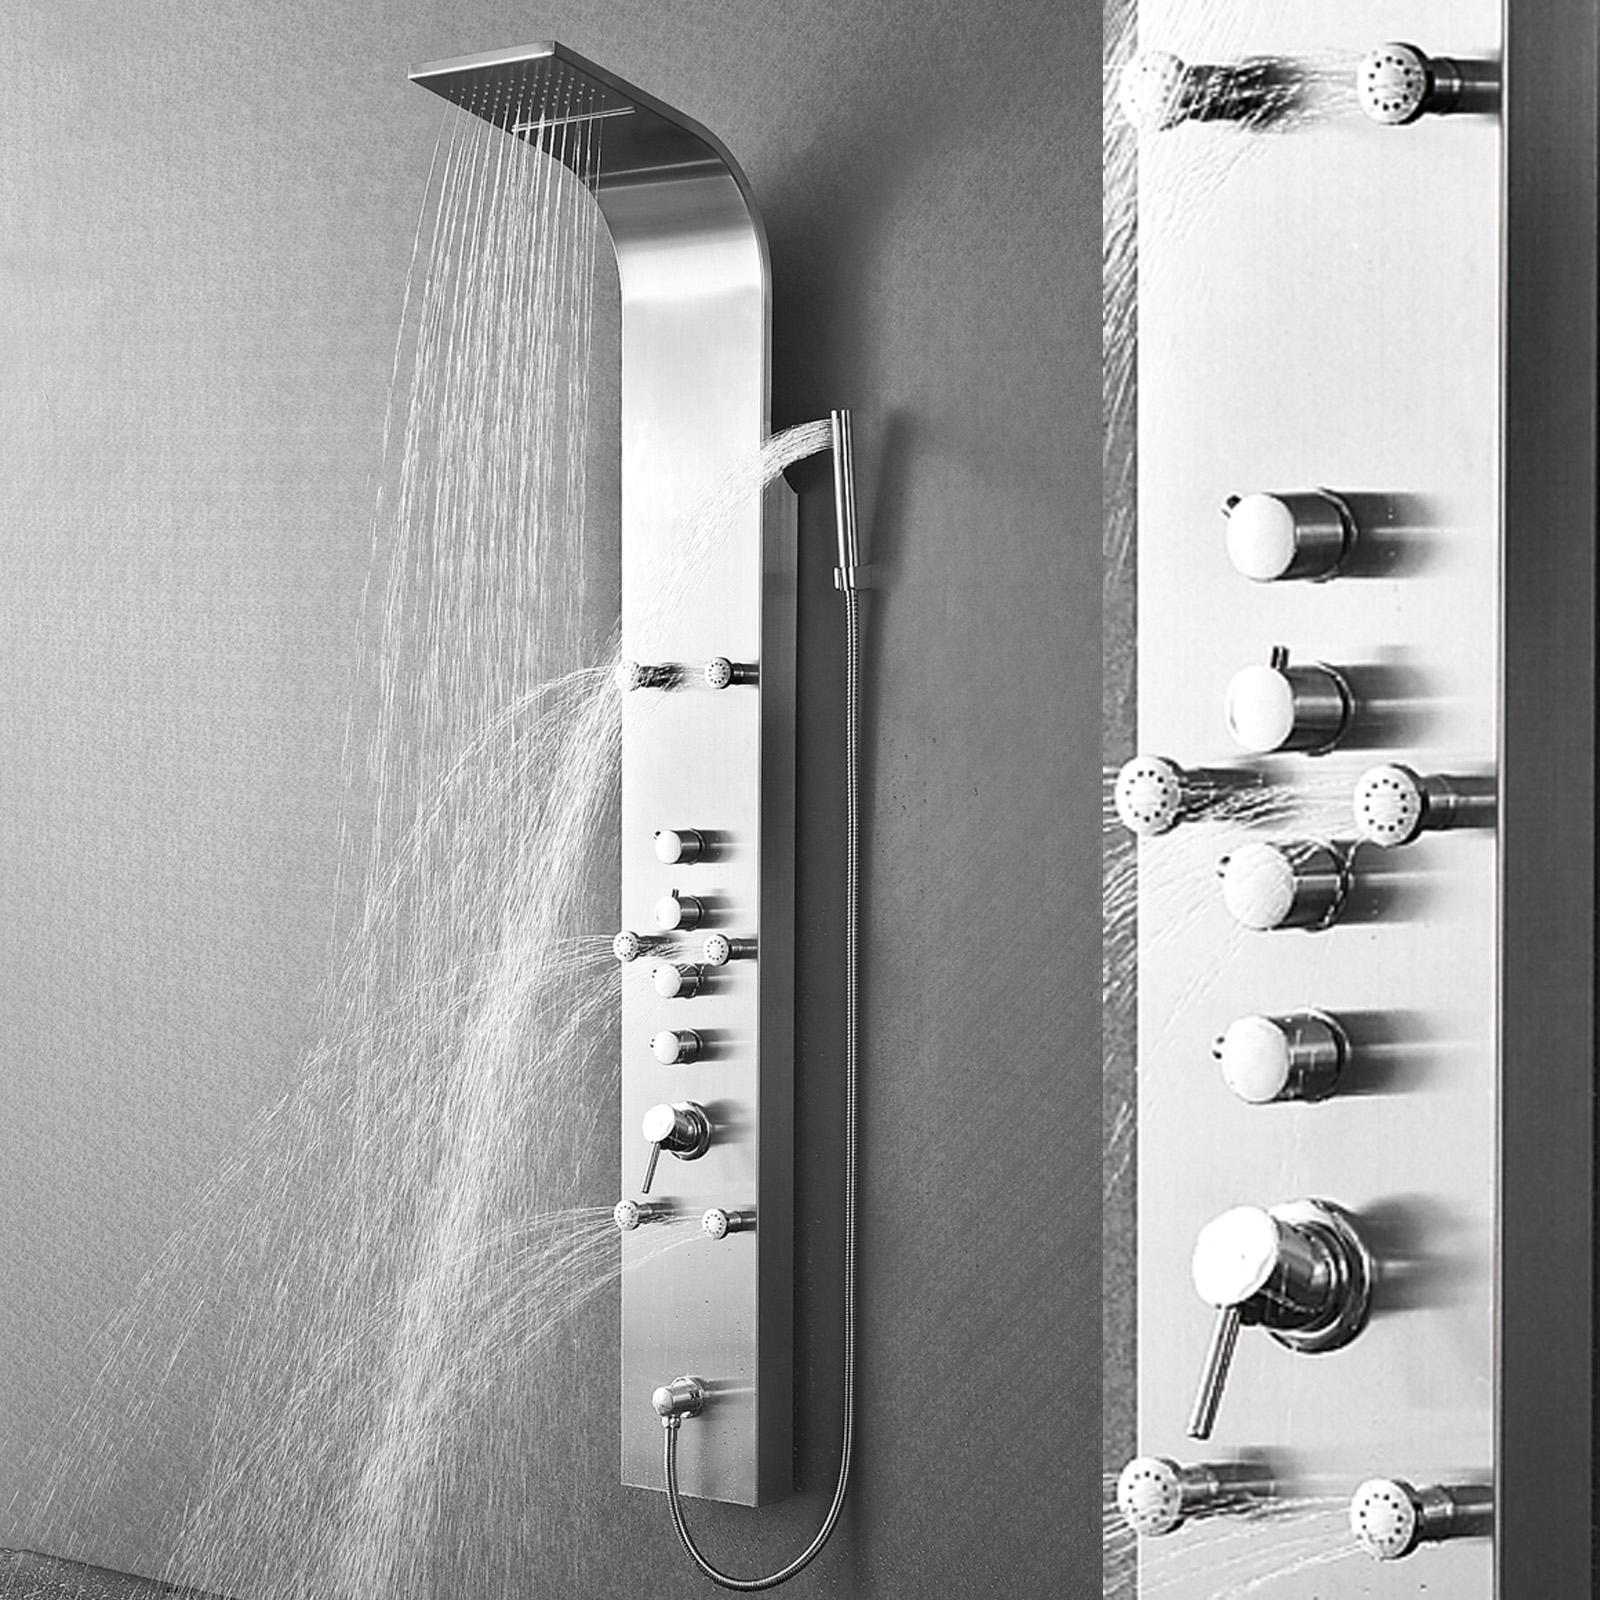 wasserfall edelstahl duschpaneel duschs ule schwallbrause brausepaneel massage. Black Bedroom Furniture Sets. Home Design Ideas